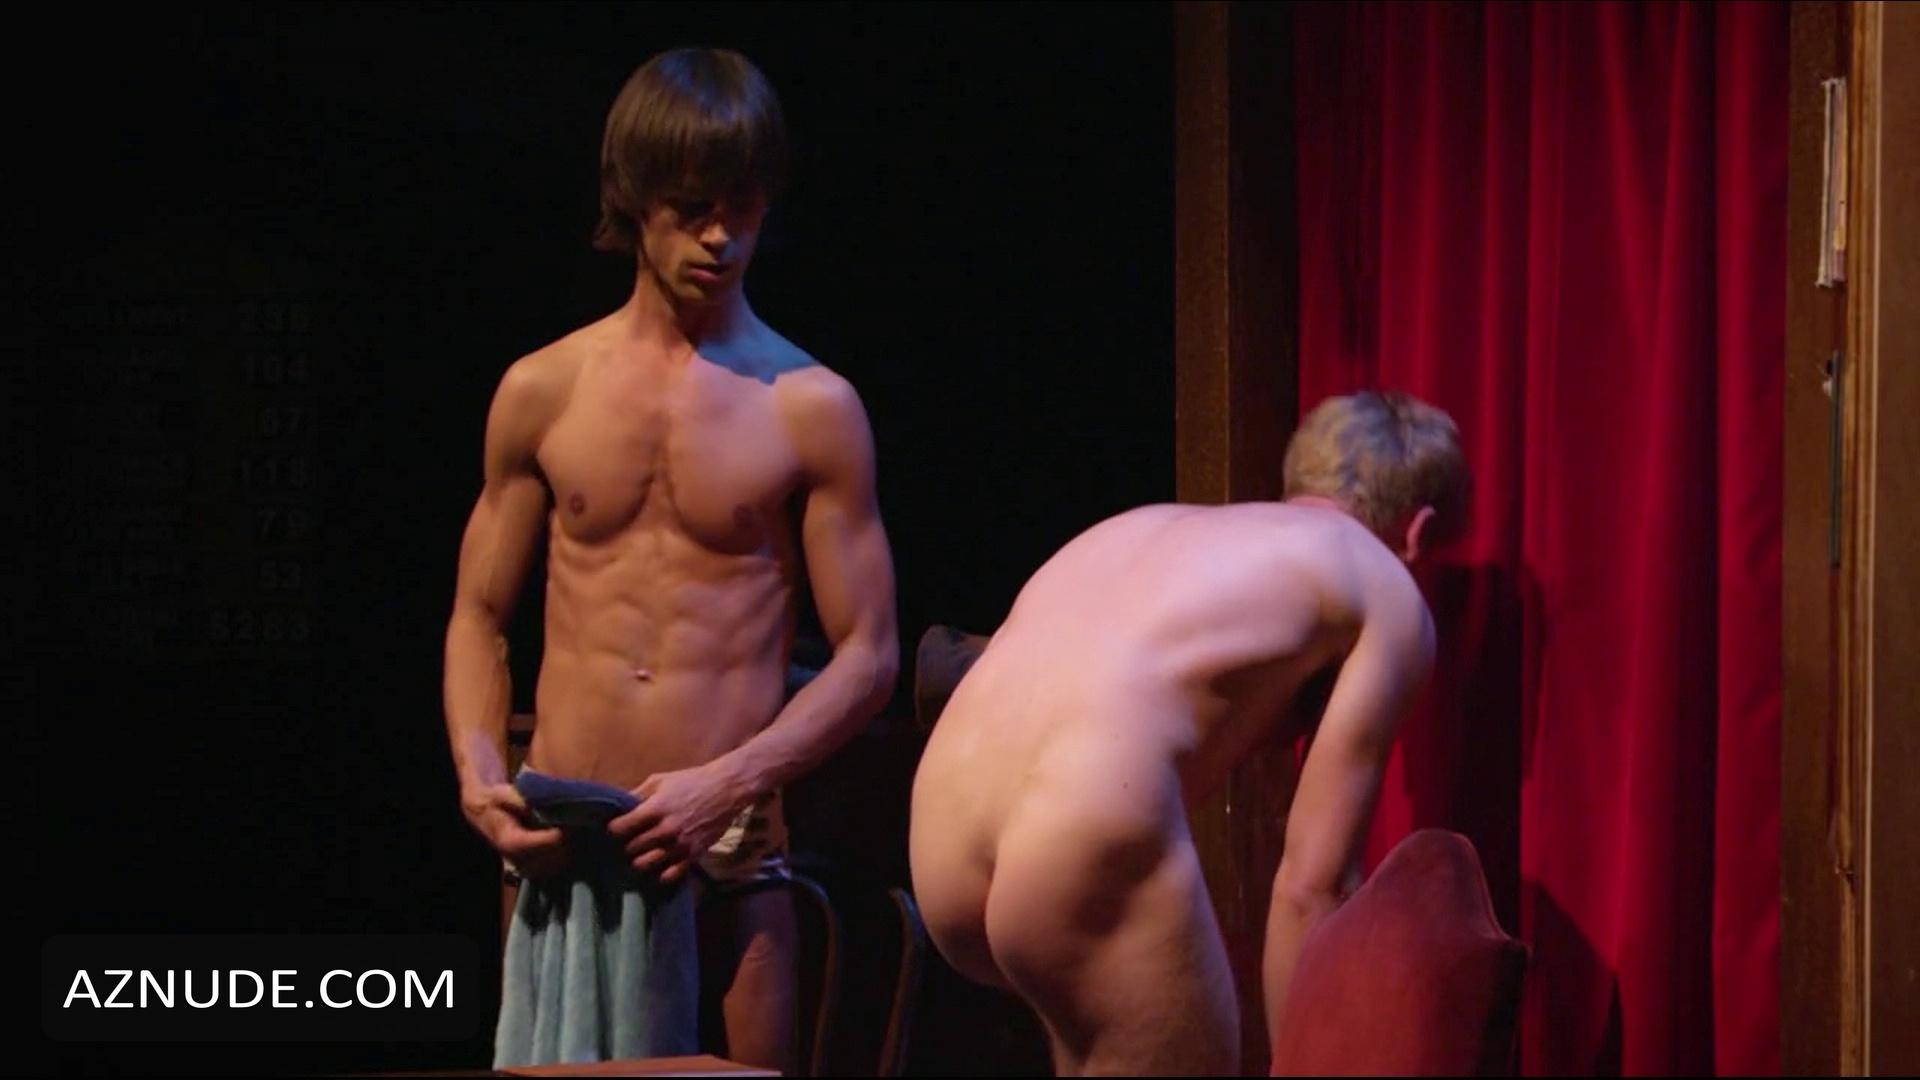 Southern baptist perspective on masturbation take turns